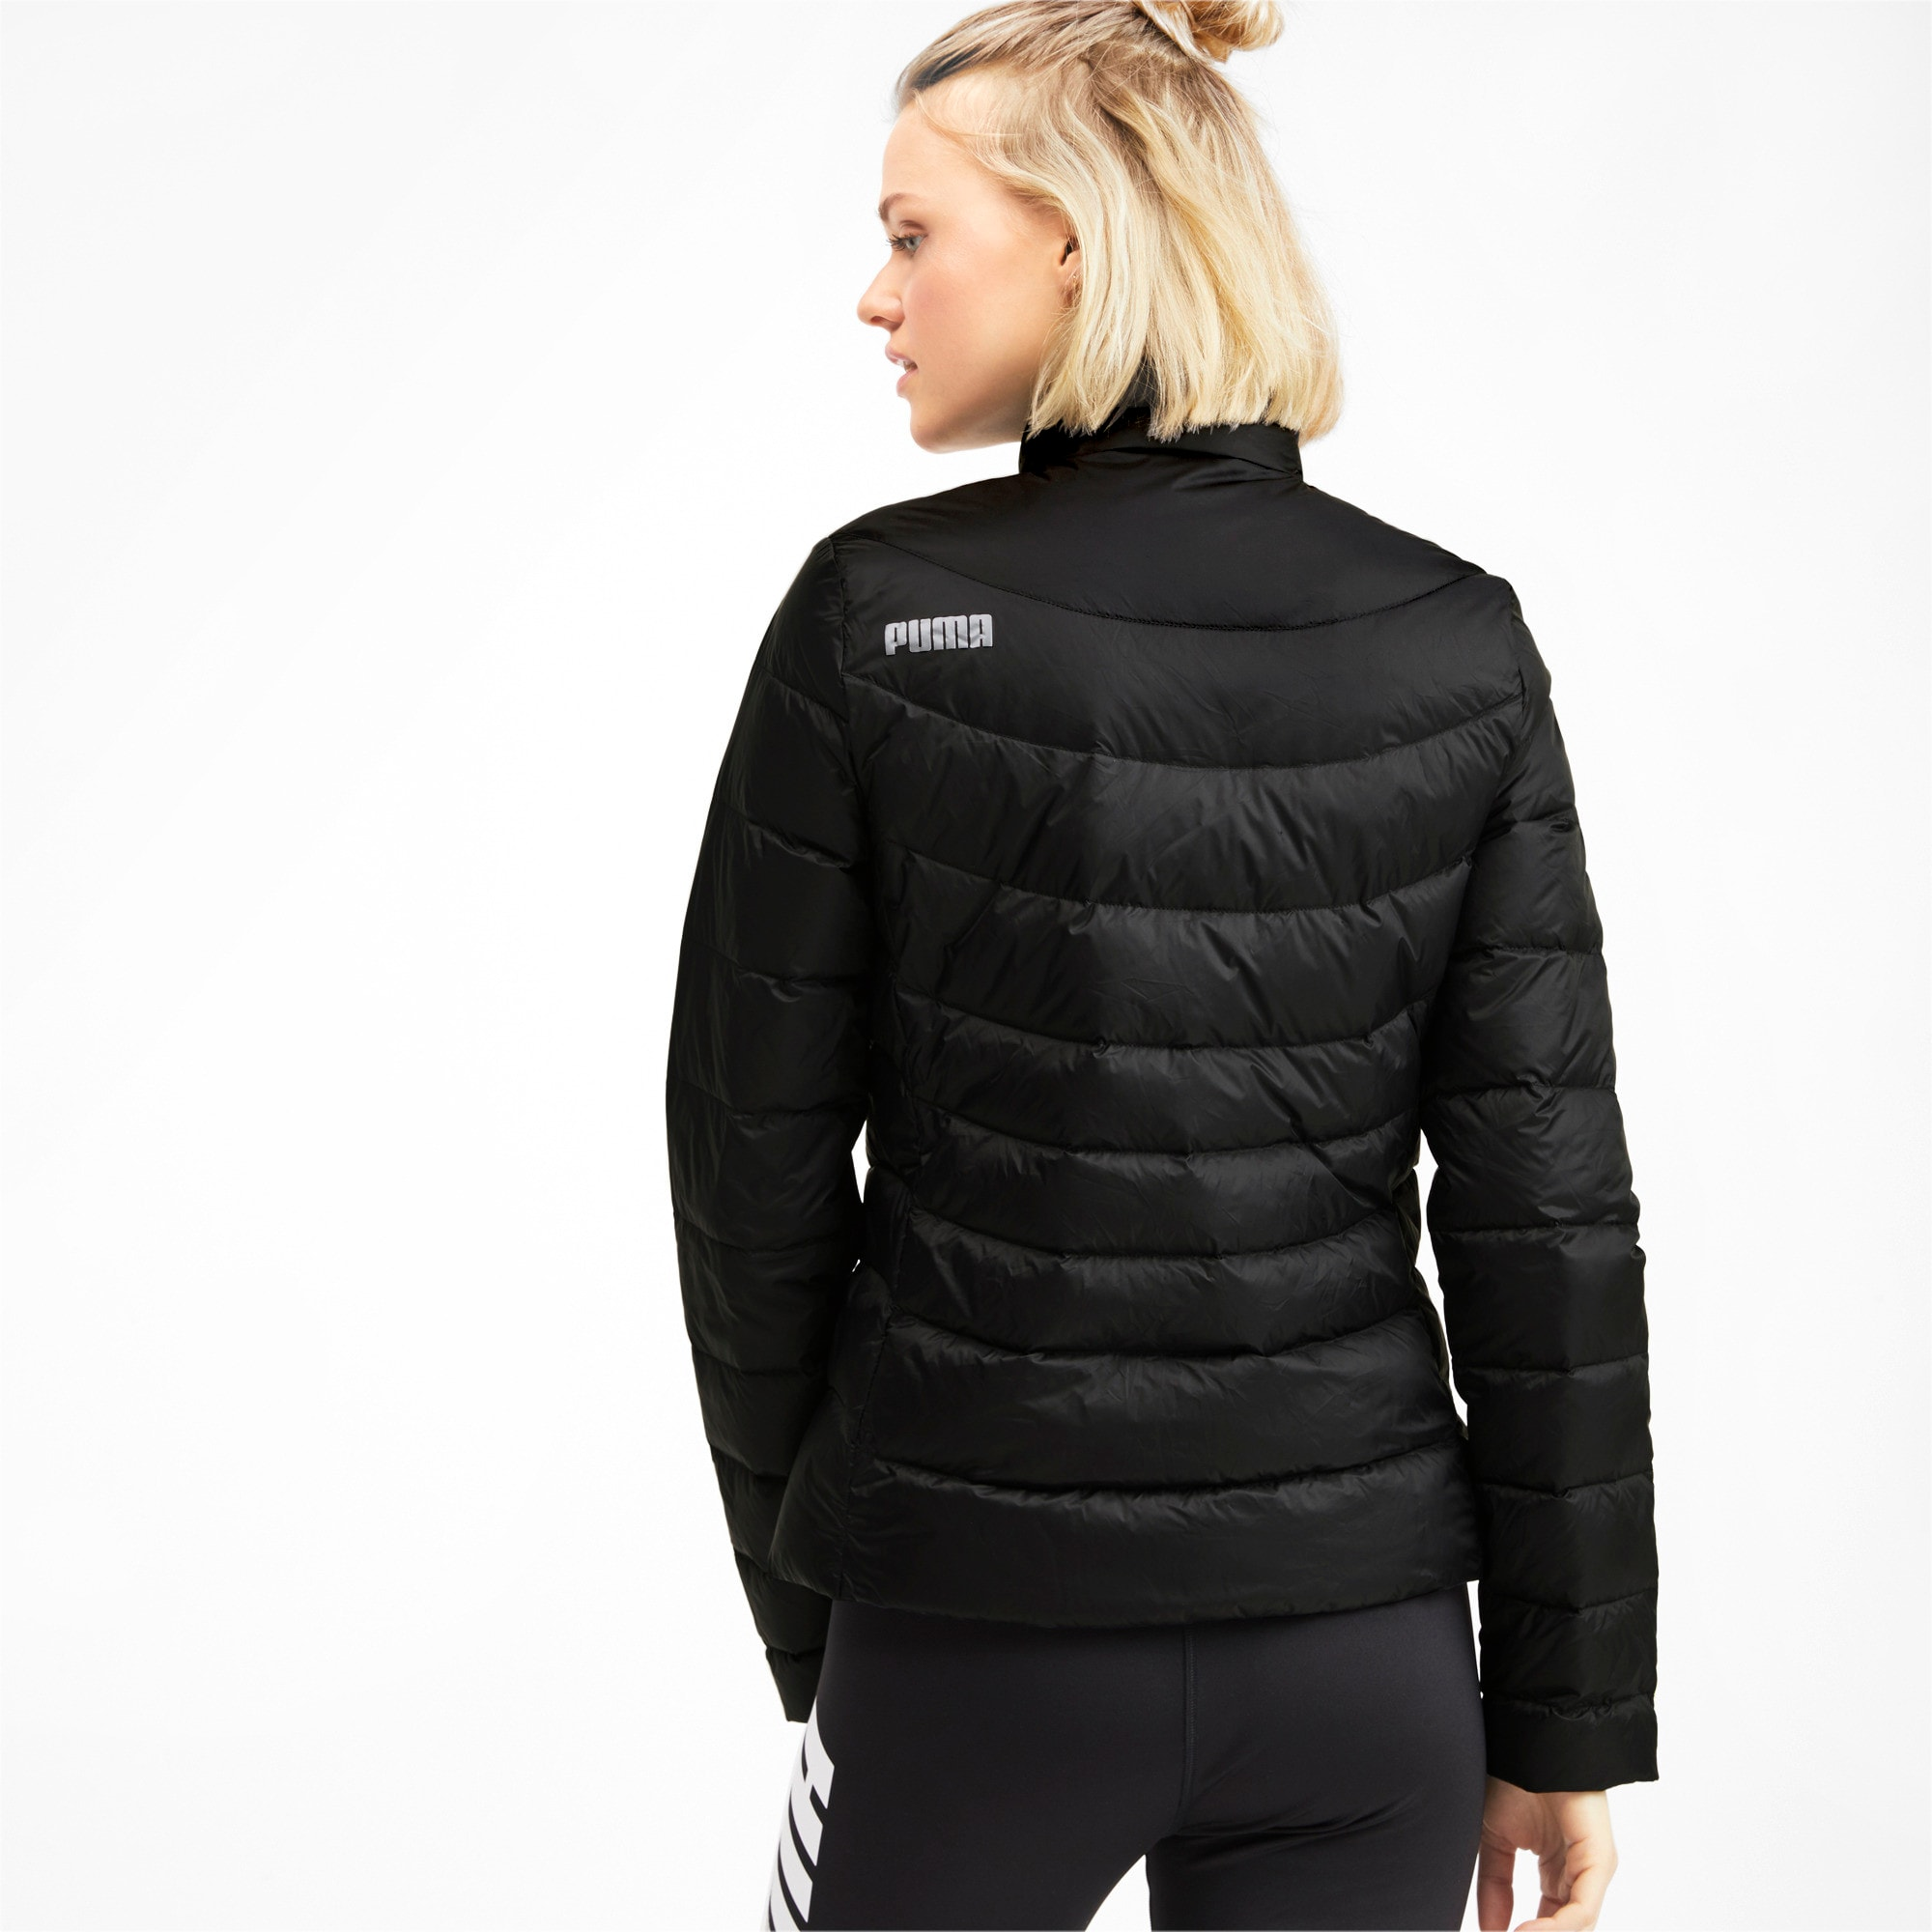 Thumbnail 2 of PWRWarm packLITE 600 Down Women's Jacket, Puma Black, medium